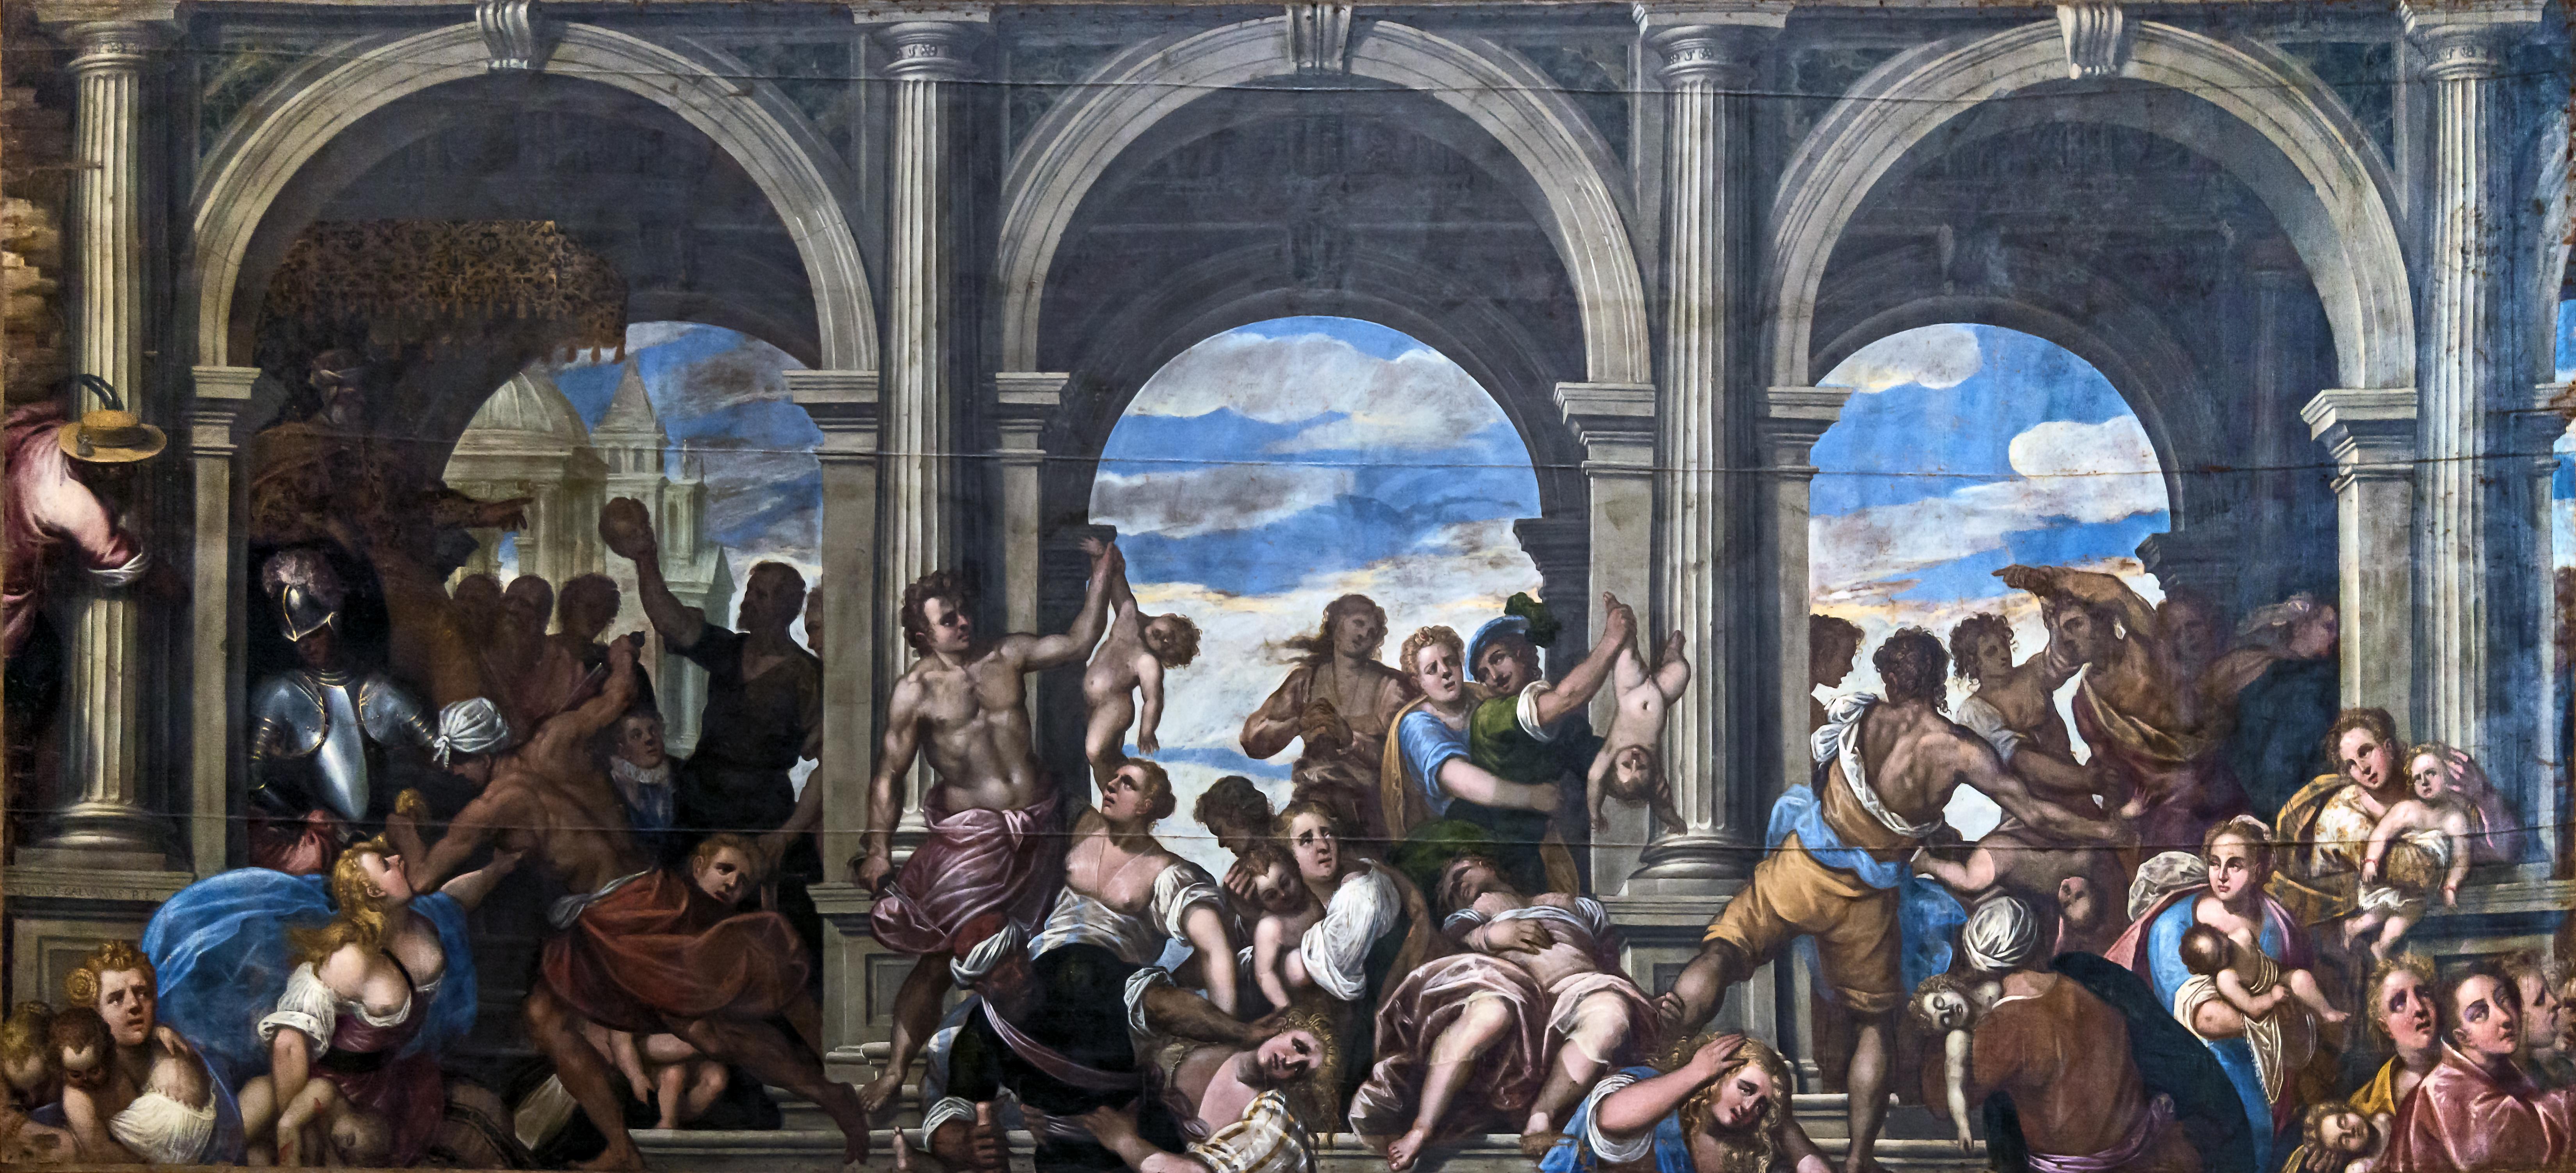 Santa_Giustina_(Padua)_-_Chapel_of_Saint